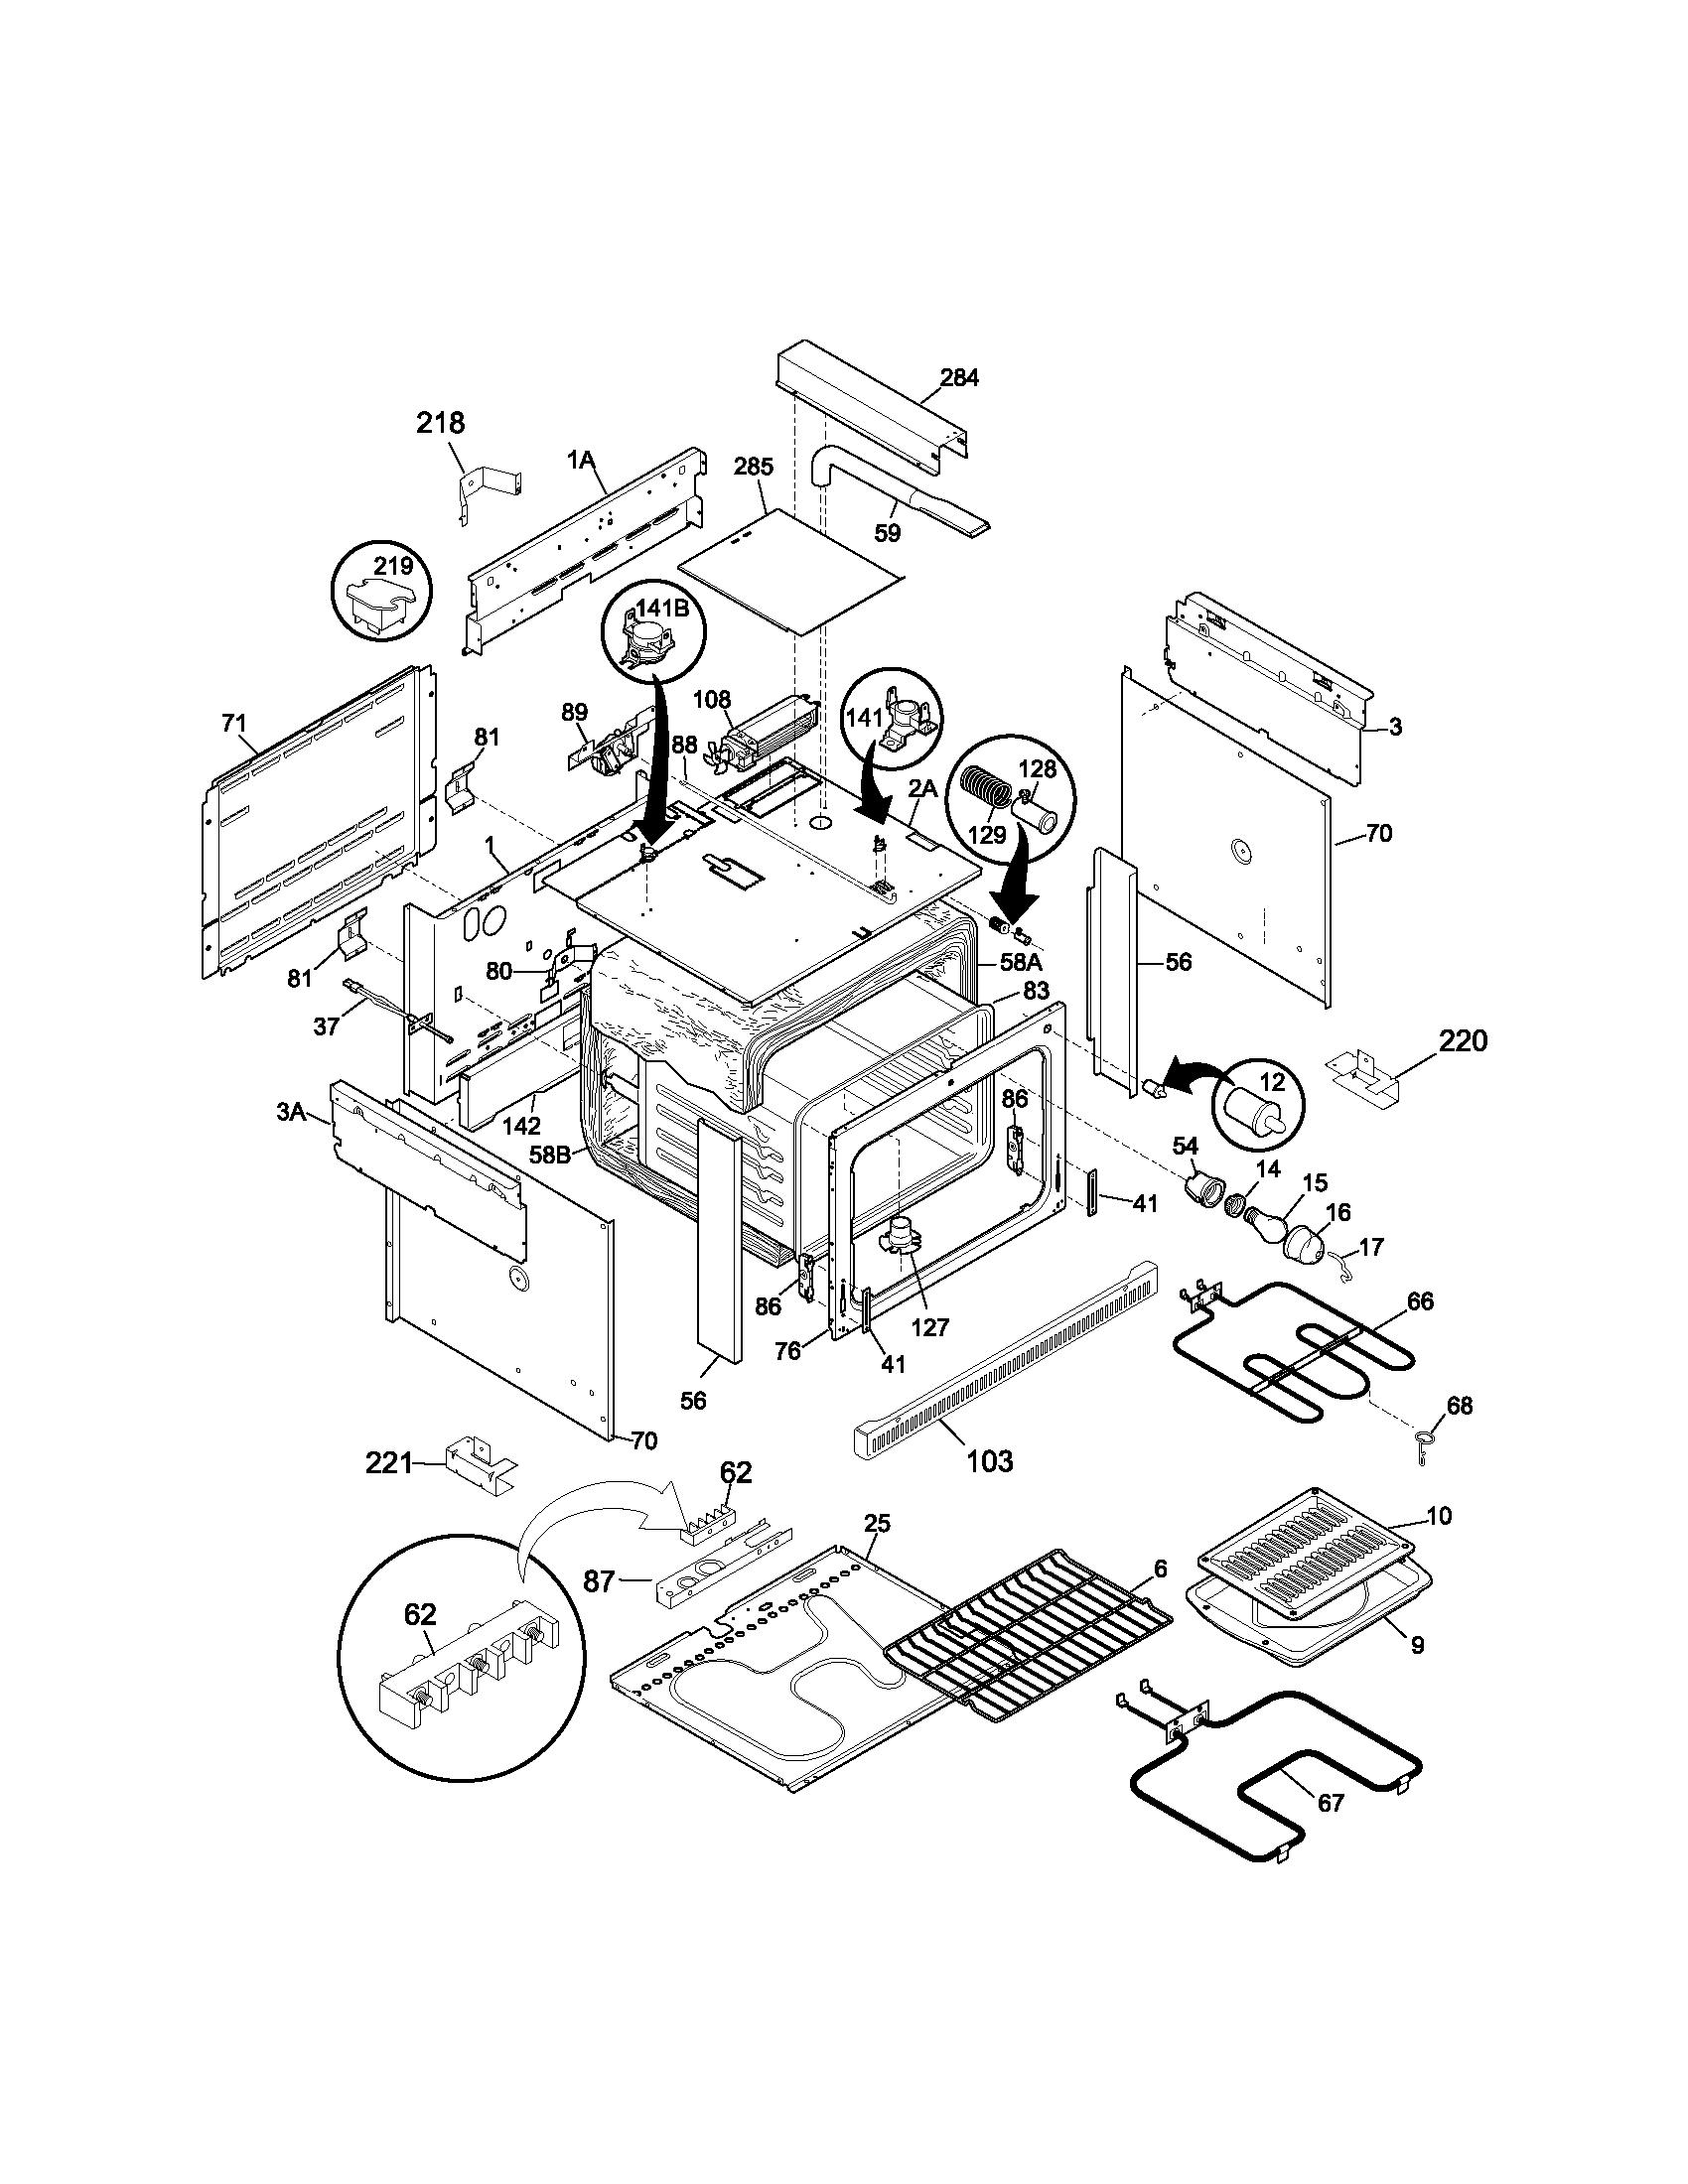 Kenmore 790 Blower Motor Cooling Fan Assembly